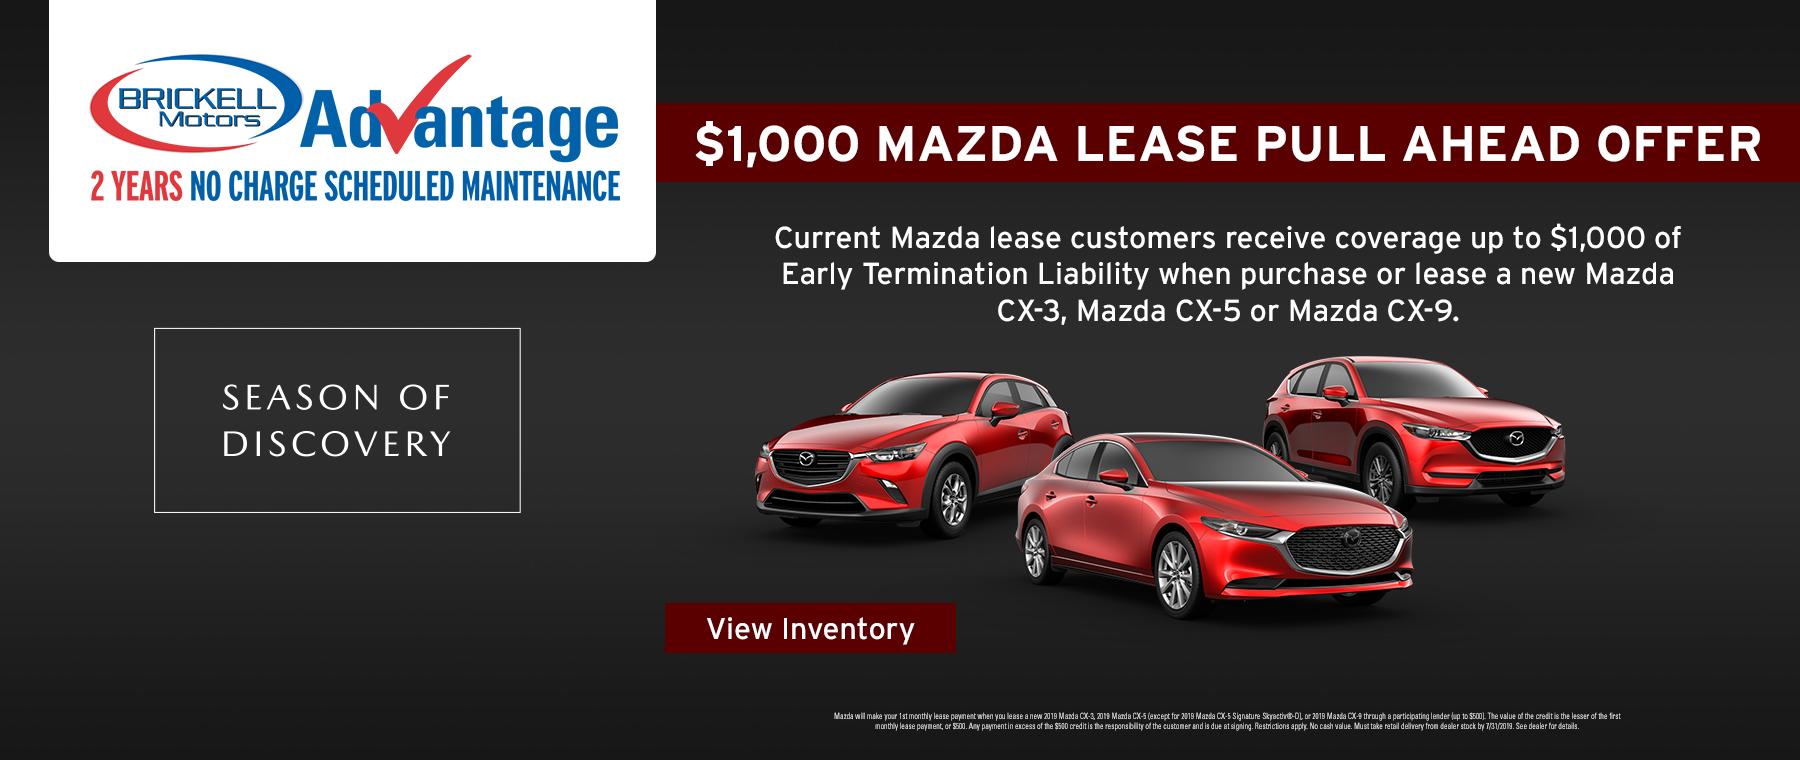 Mazda Lease Offer